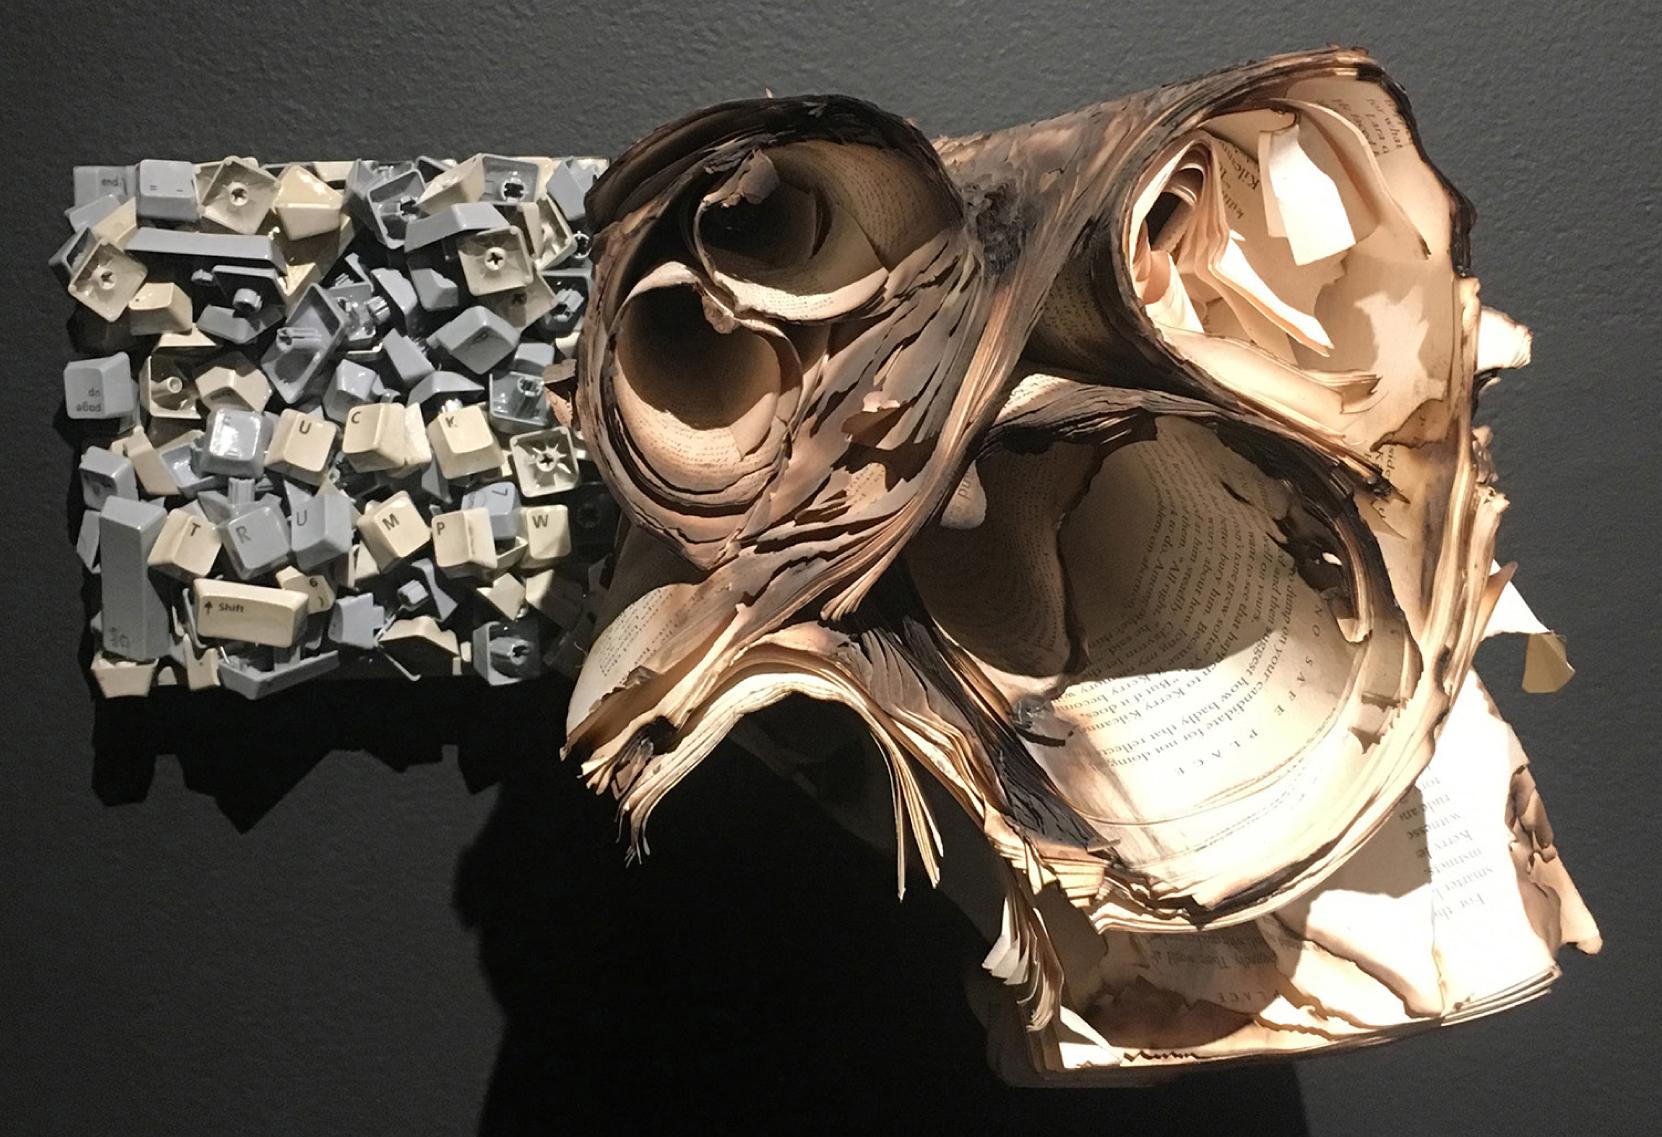 EMILIO MALDONADO   7.5 - 12%, 6 x 12 x 13 inches / 15 x 30 x 33 cm, mixed media, 2017